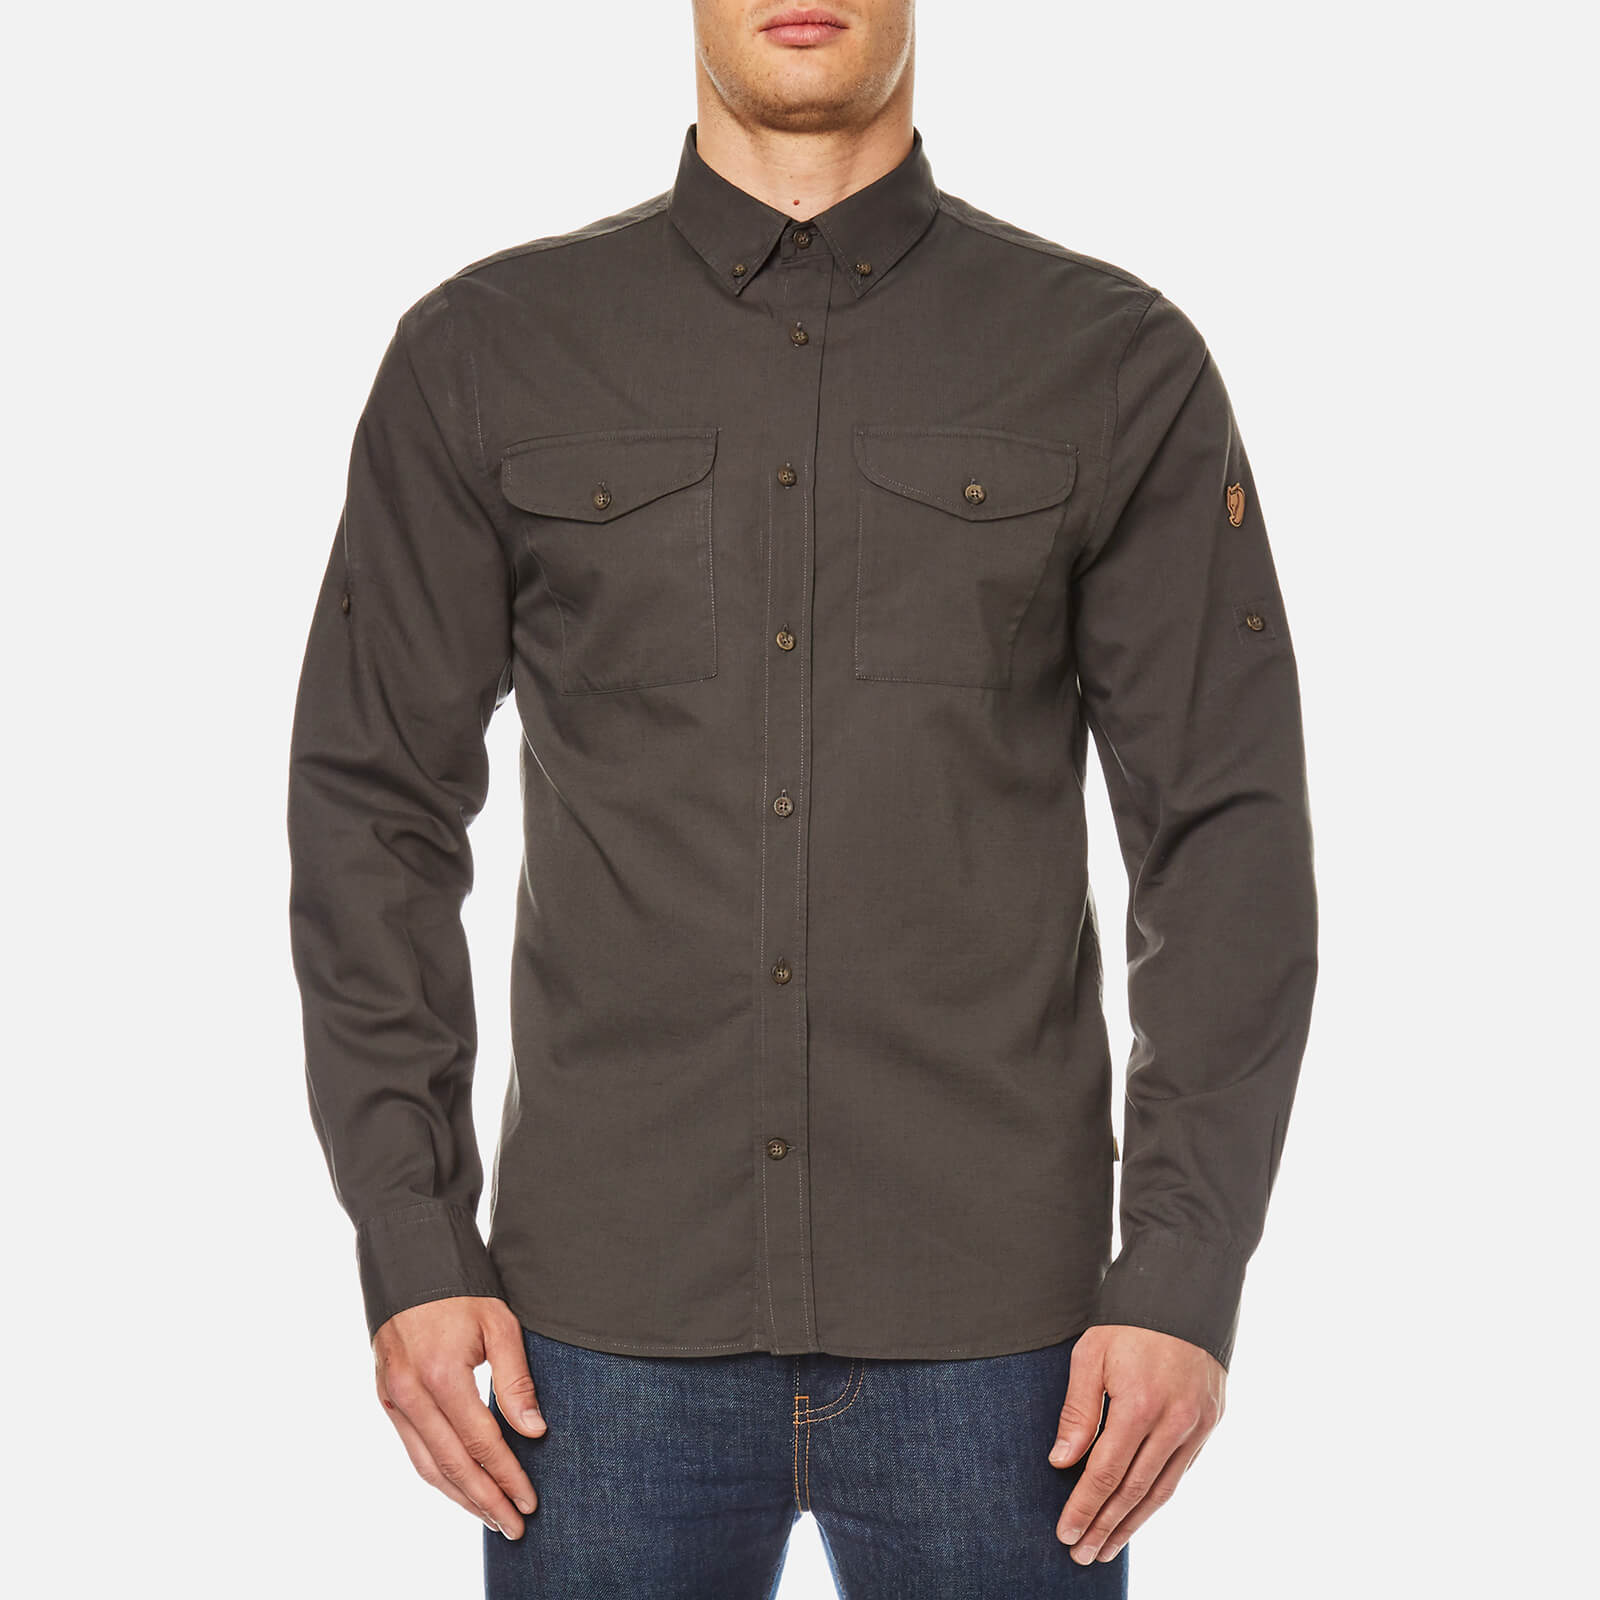 najlepiej kochany kolejna szansa kod promocyjny Fjallraven Men's Ovik Lite Long Sleeve Shirt - Mountain Grey